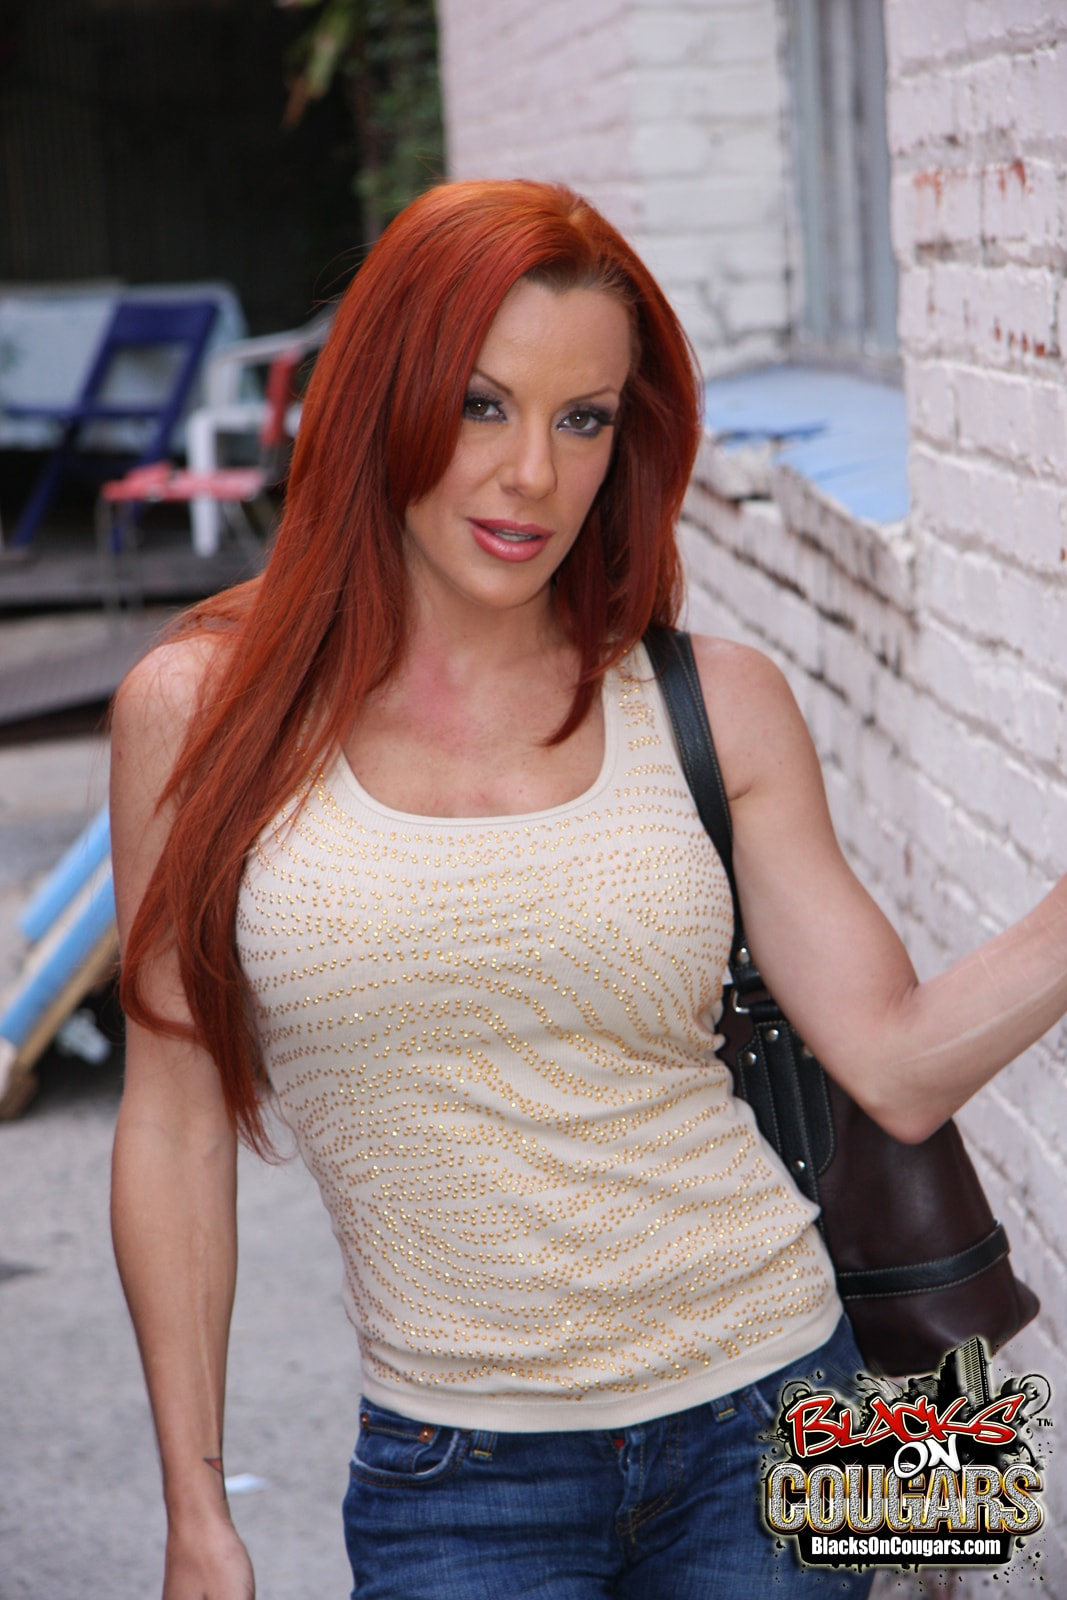 Dogfart '- Blacks On Cougars' starring Shannon Kelly (Photo 5)